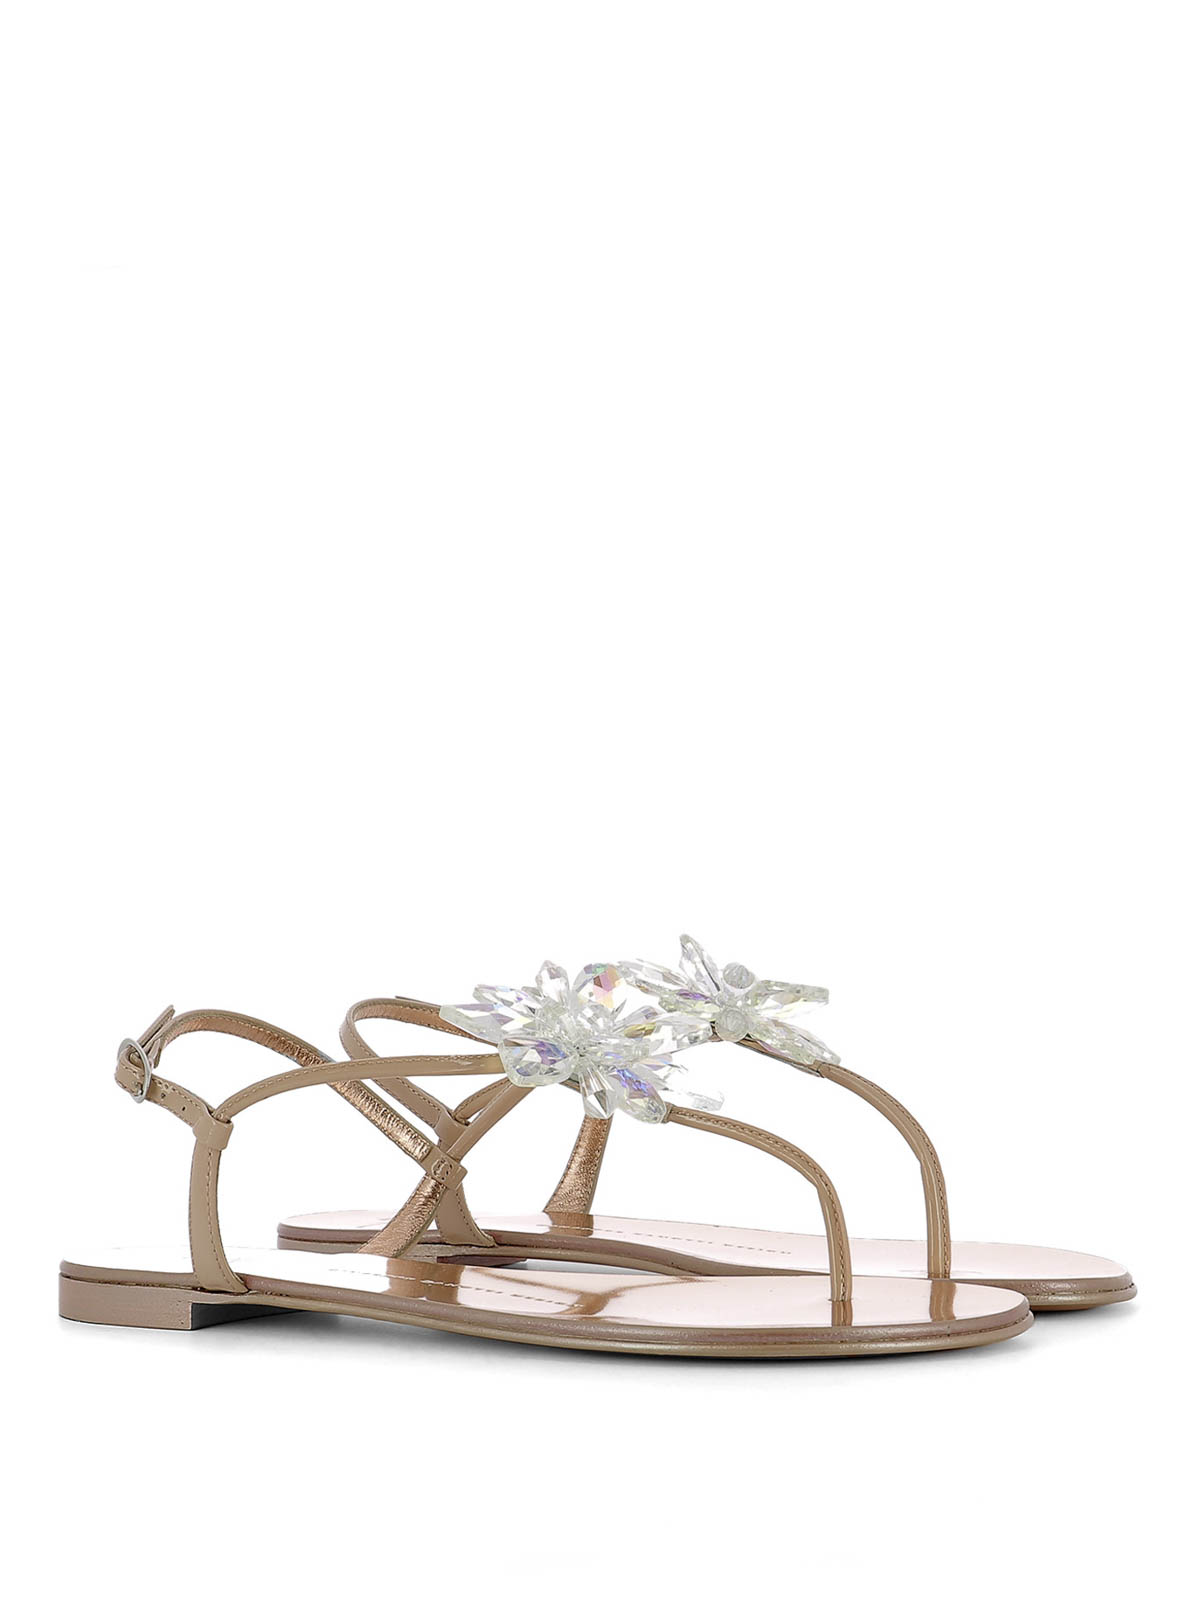 cf6c08765553 Giuseppe Zanotti - Letizia jewel flower sandals - sandals - E70028 003